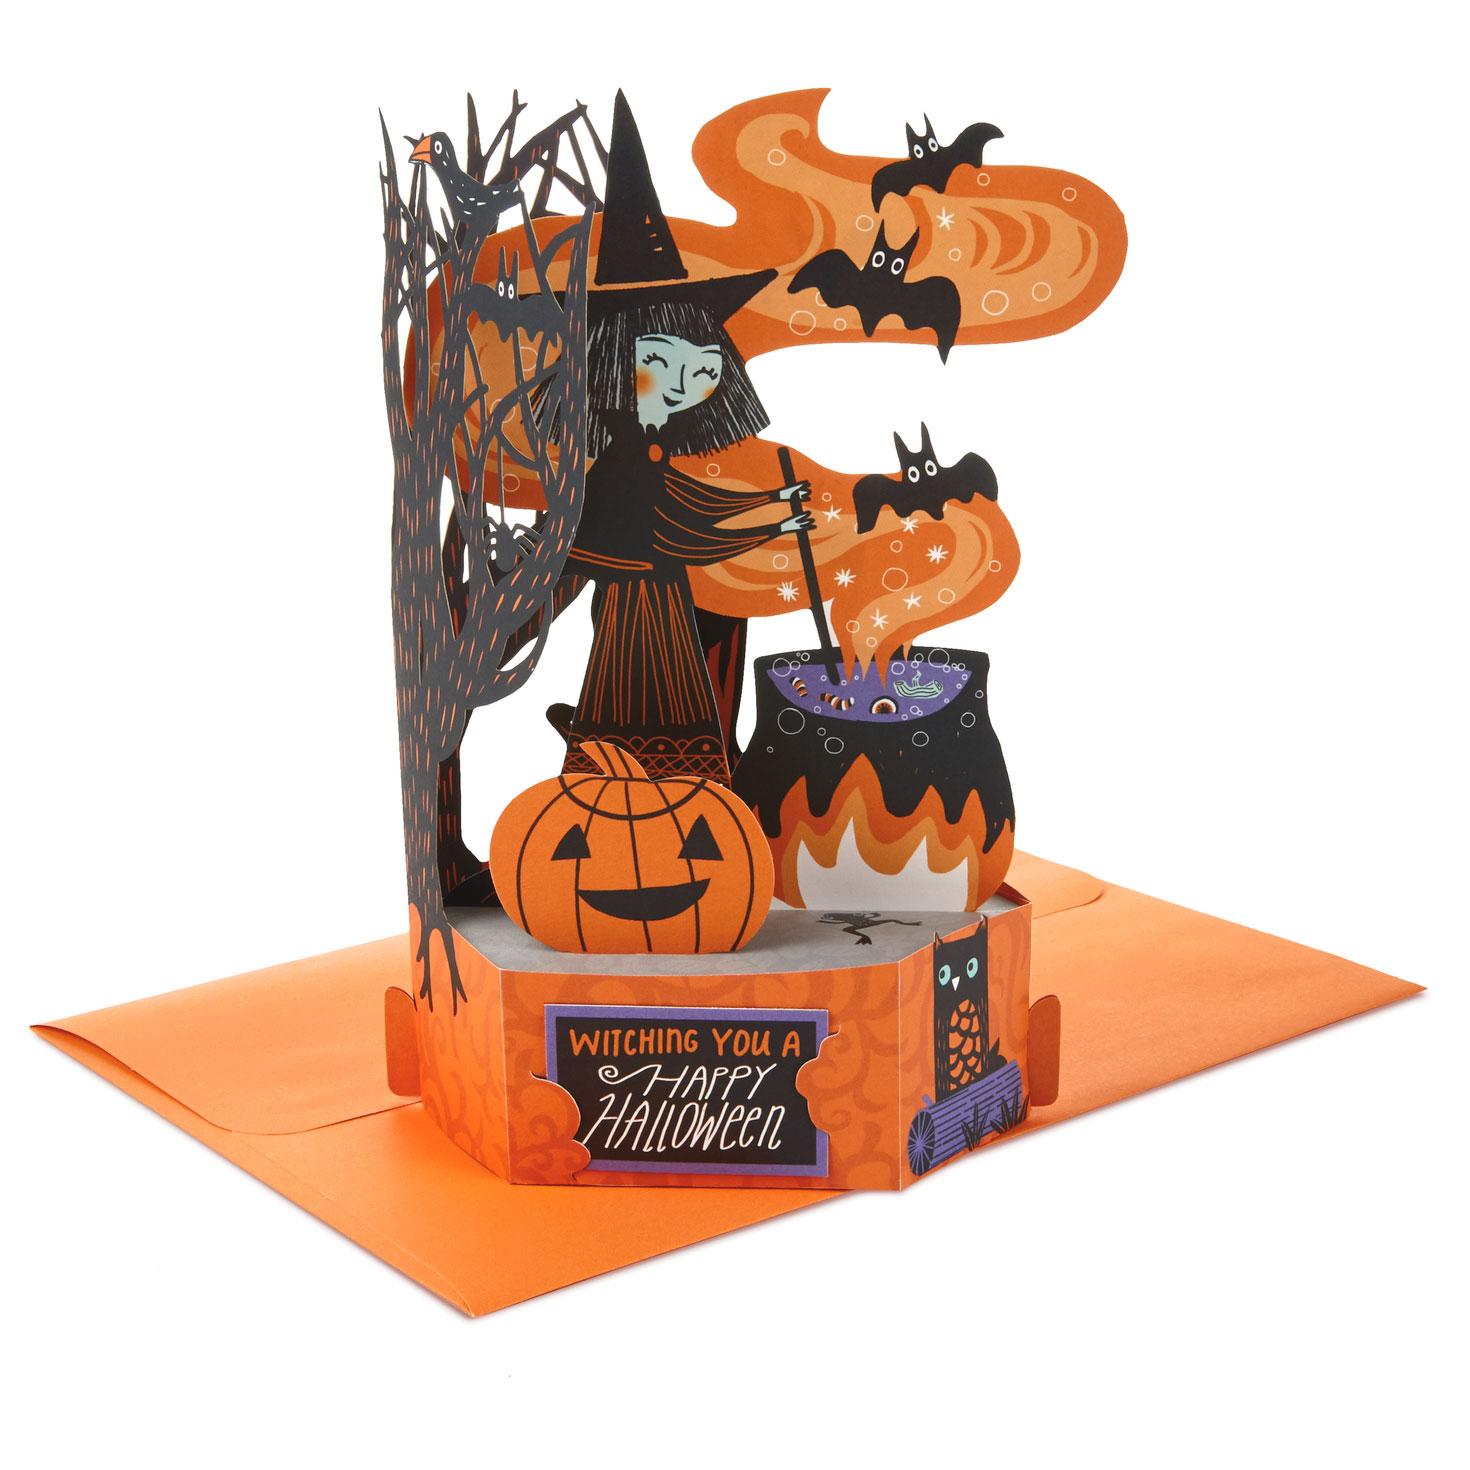 Halloween Pop.Witch And Cauldron Pop Up Halloween Card